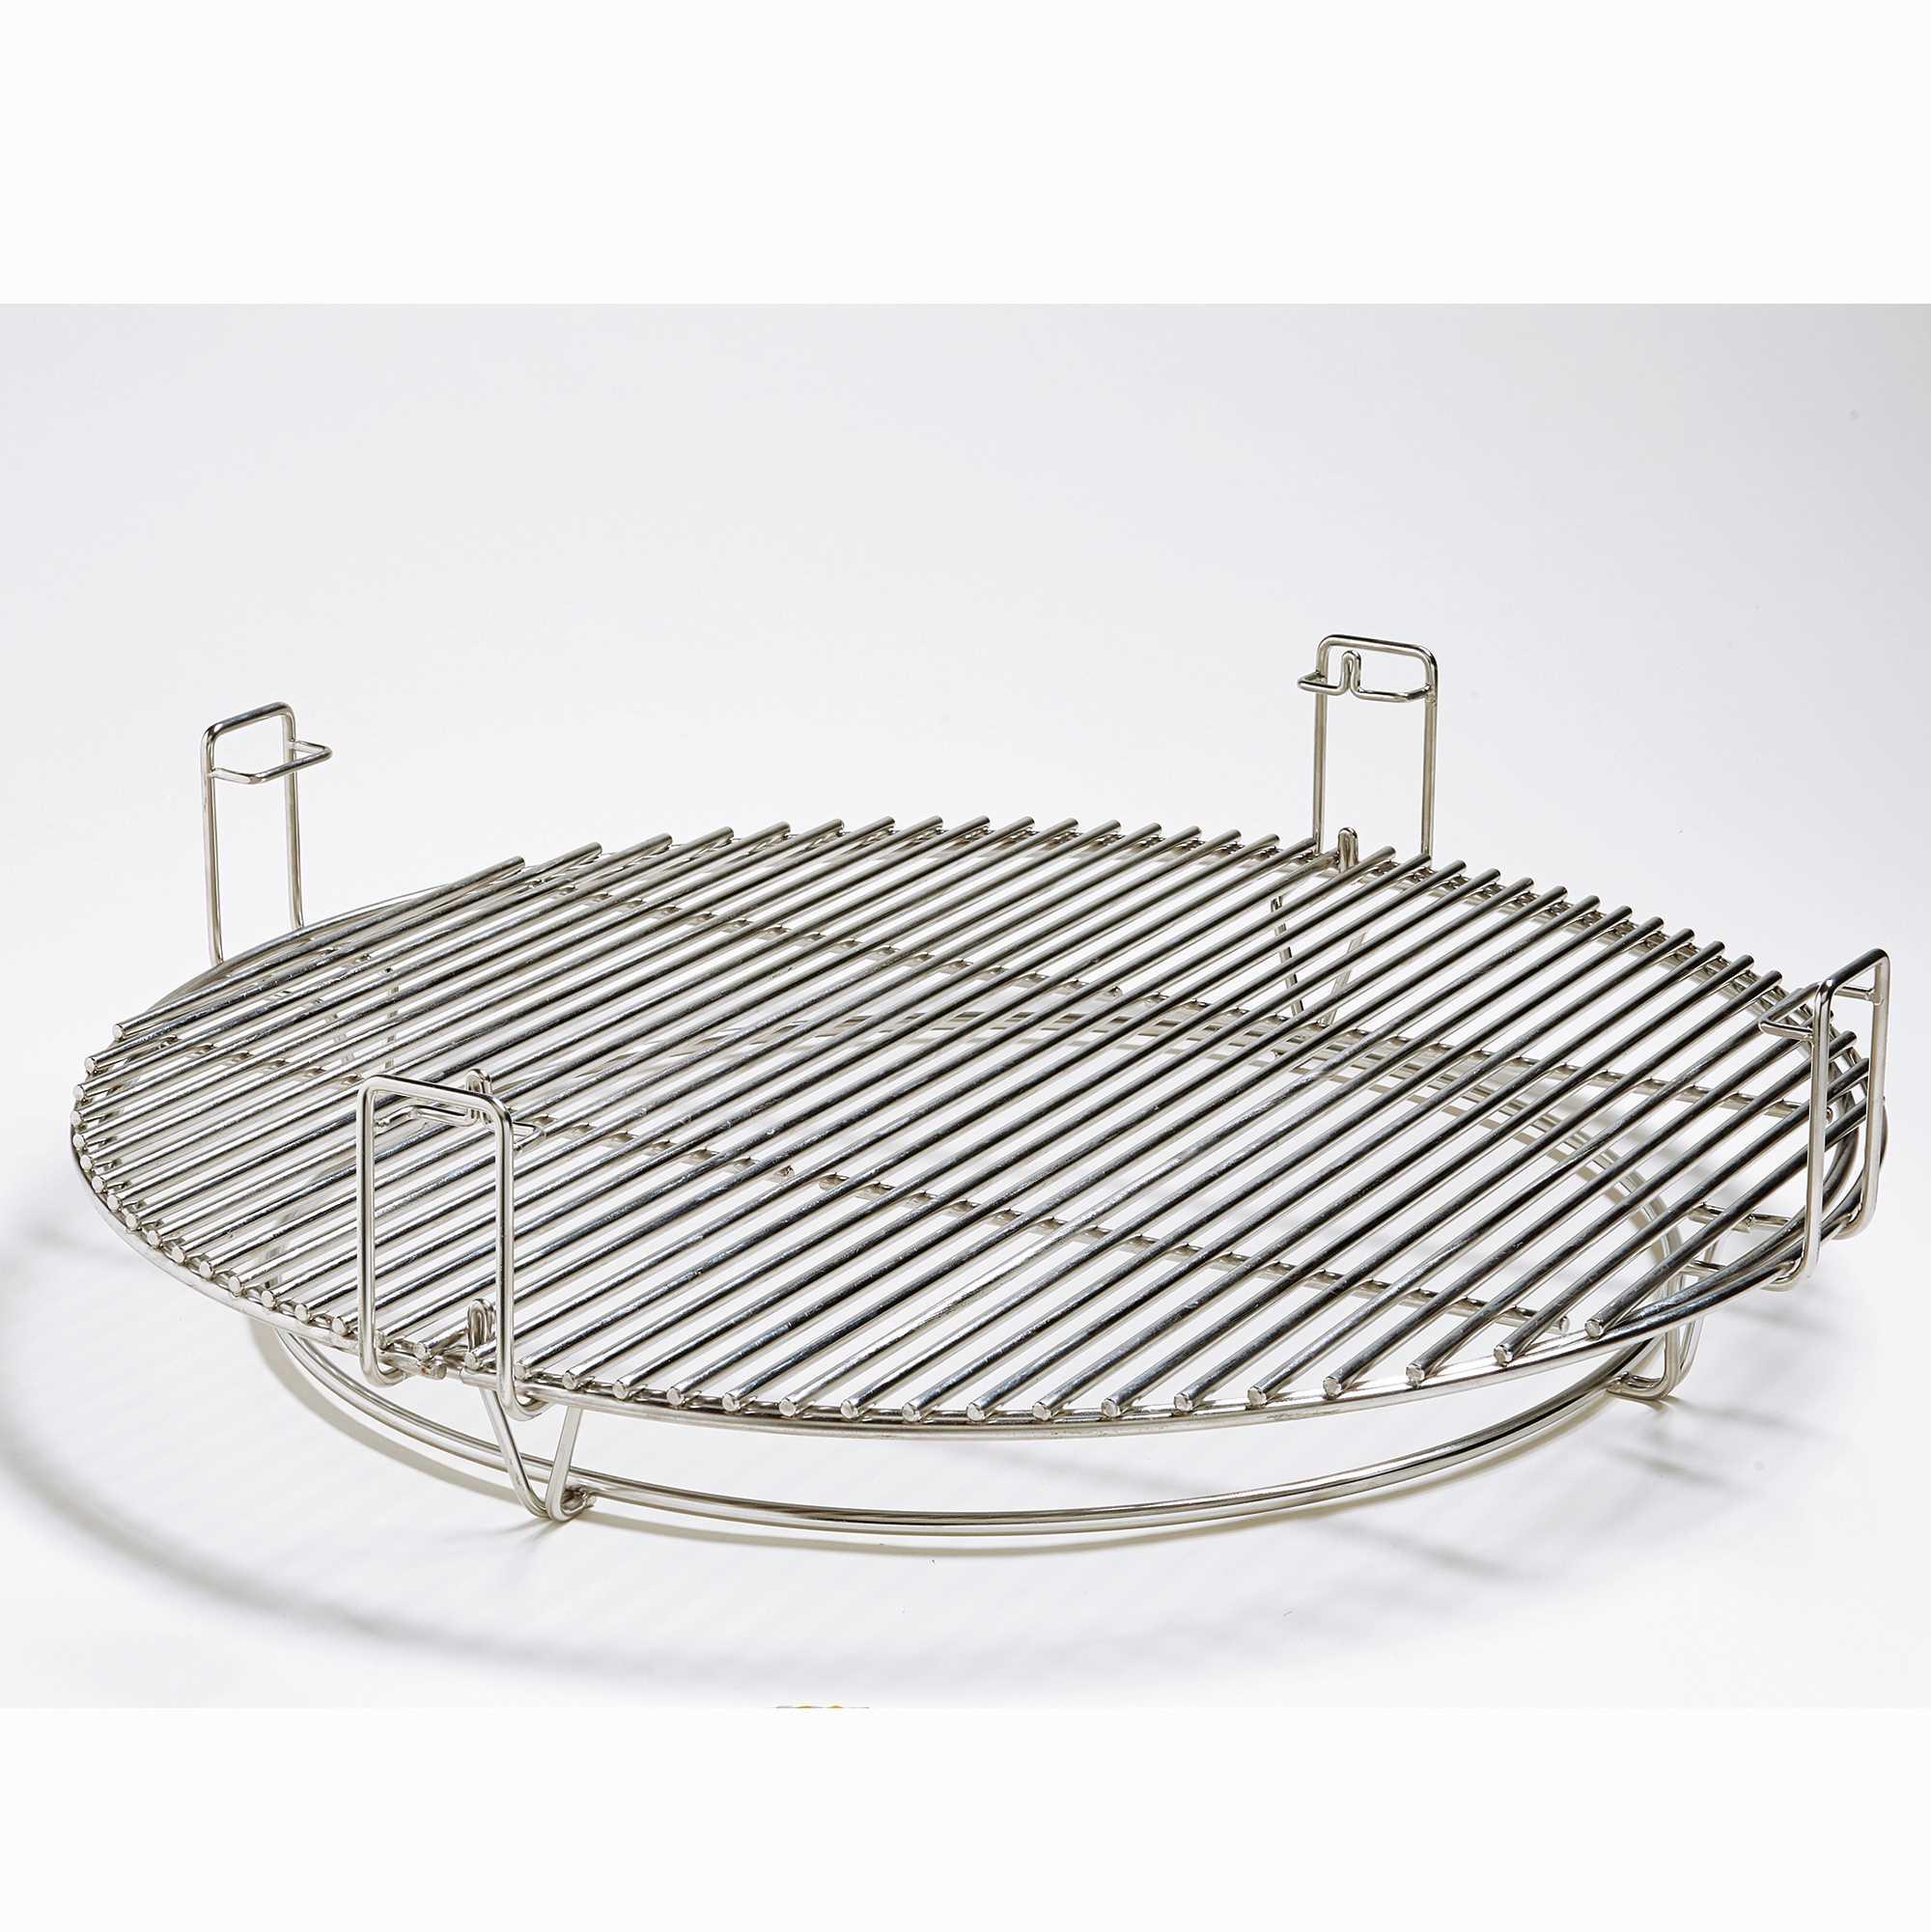 amp grill pan cshelfkw shelf rack whirlpool loading hp for is ebay cooker small oven adjustable itm image